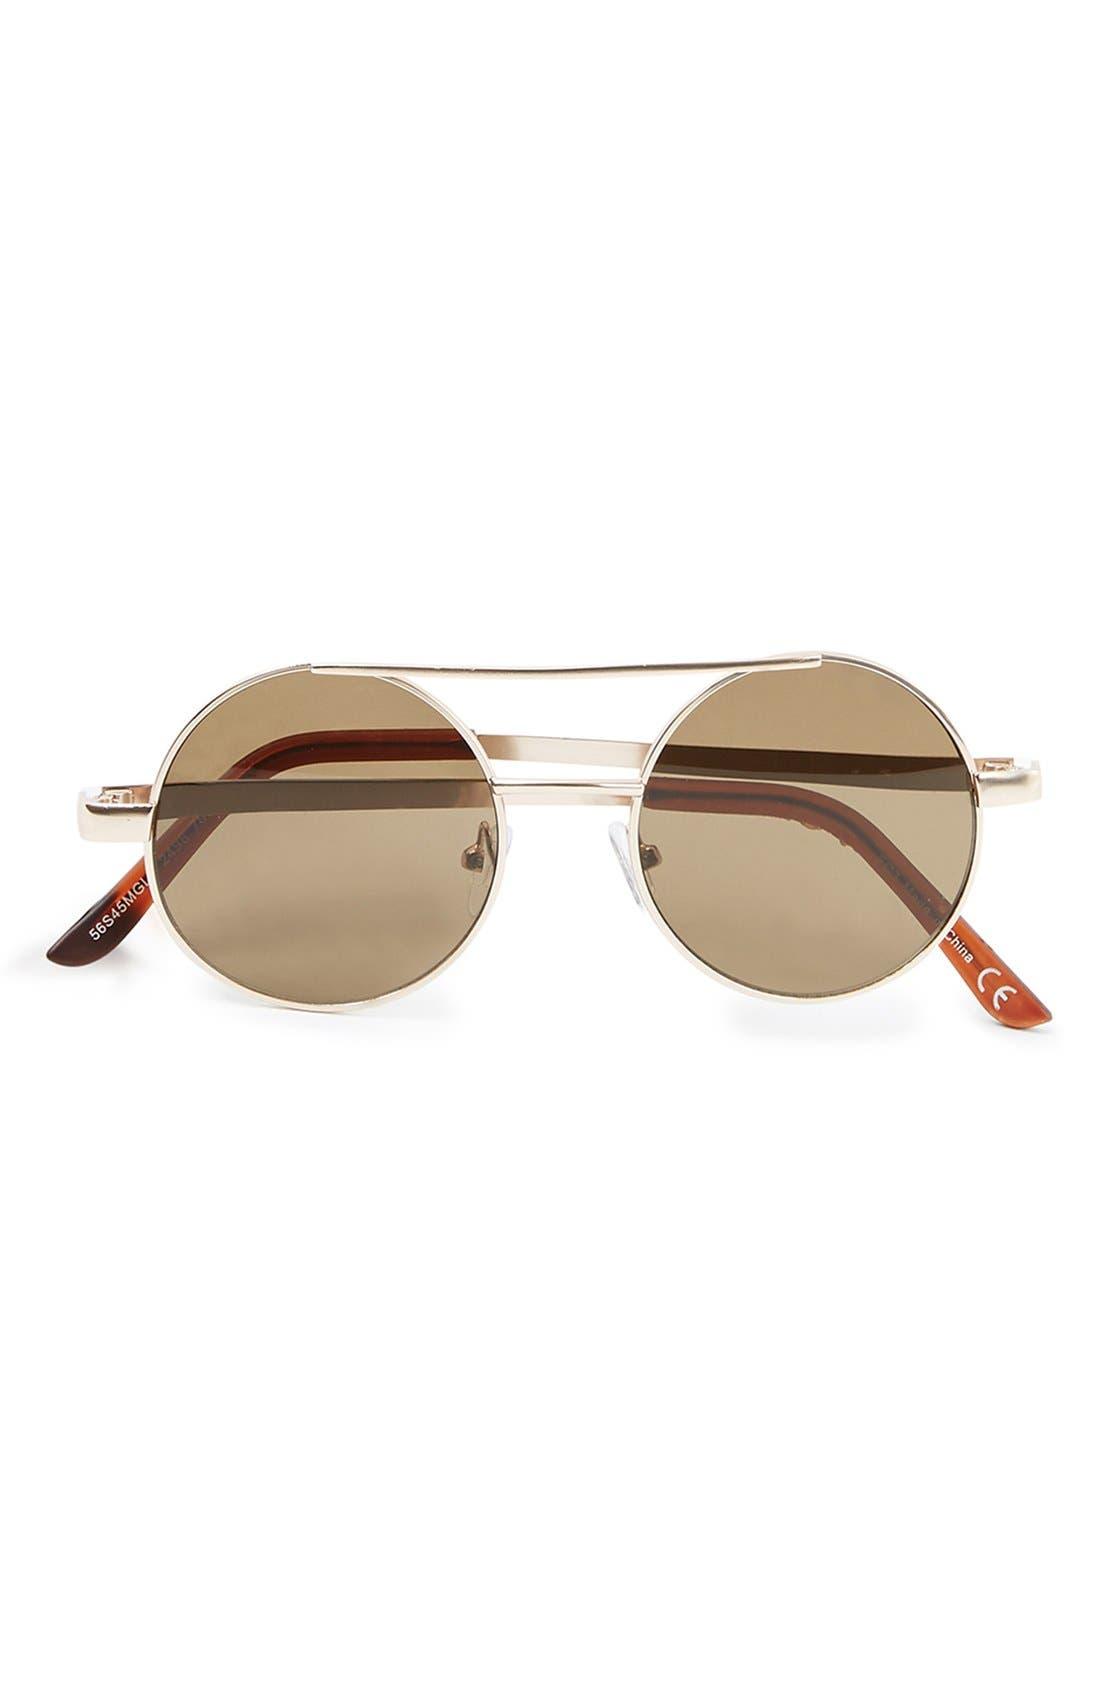 Main Image - Topman 49mm Round Metal Sunglasses